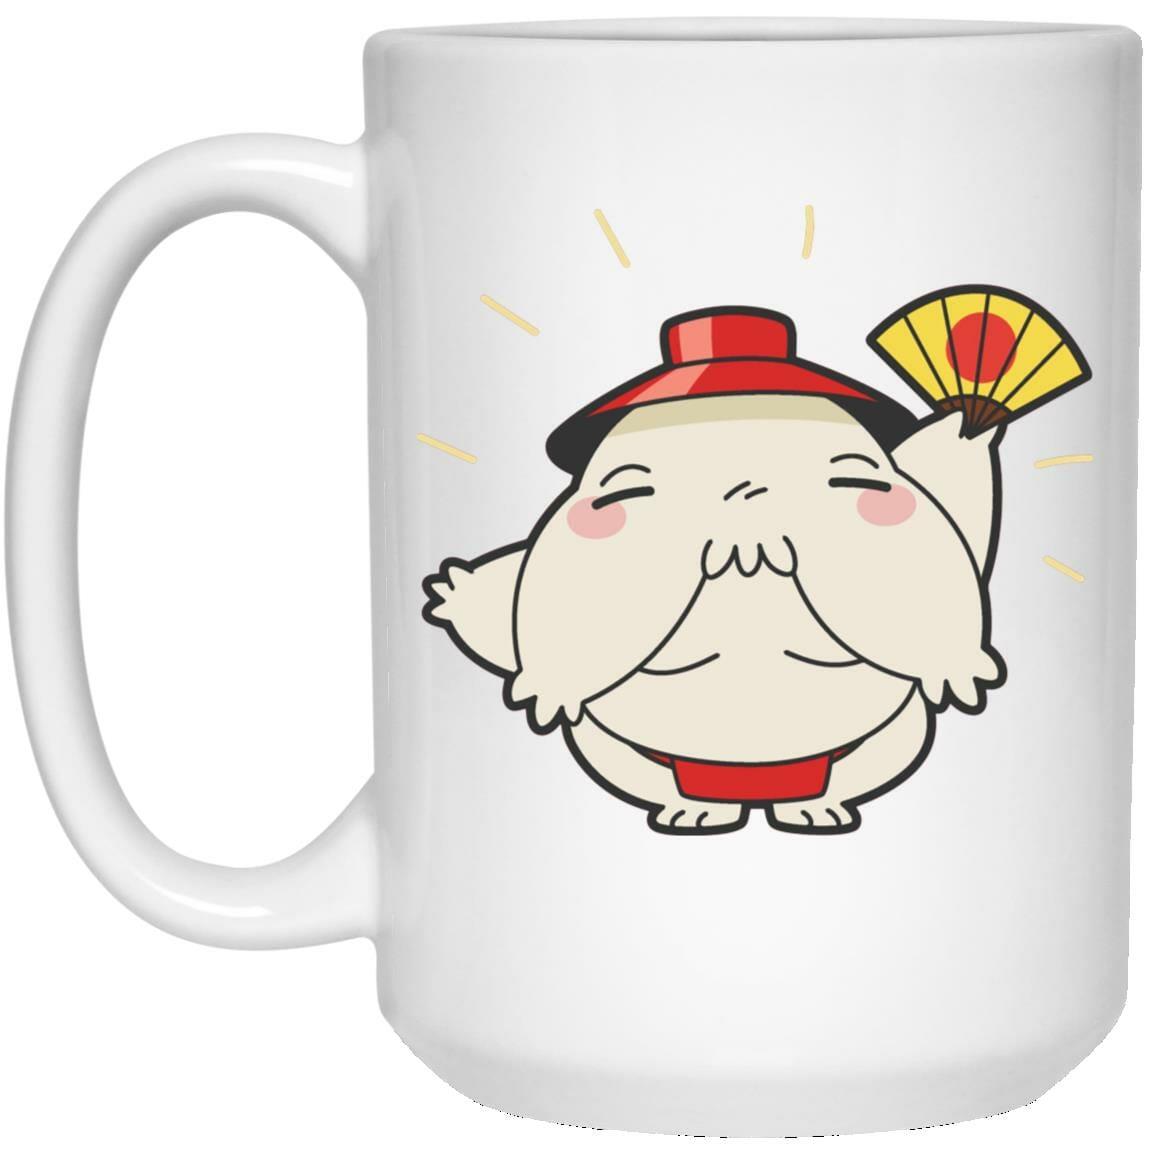 Spirited Aways – Oshirasama Chibi Mug